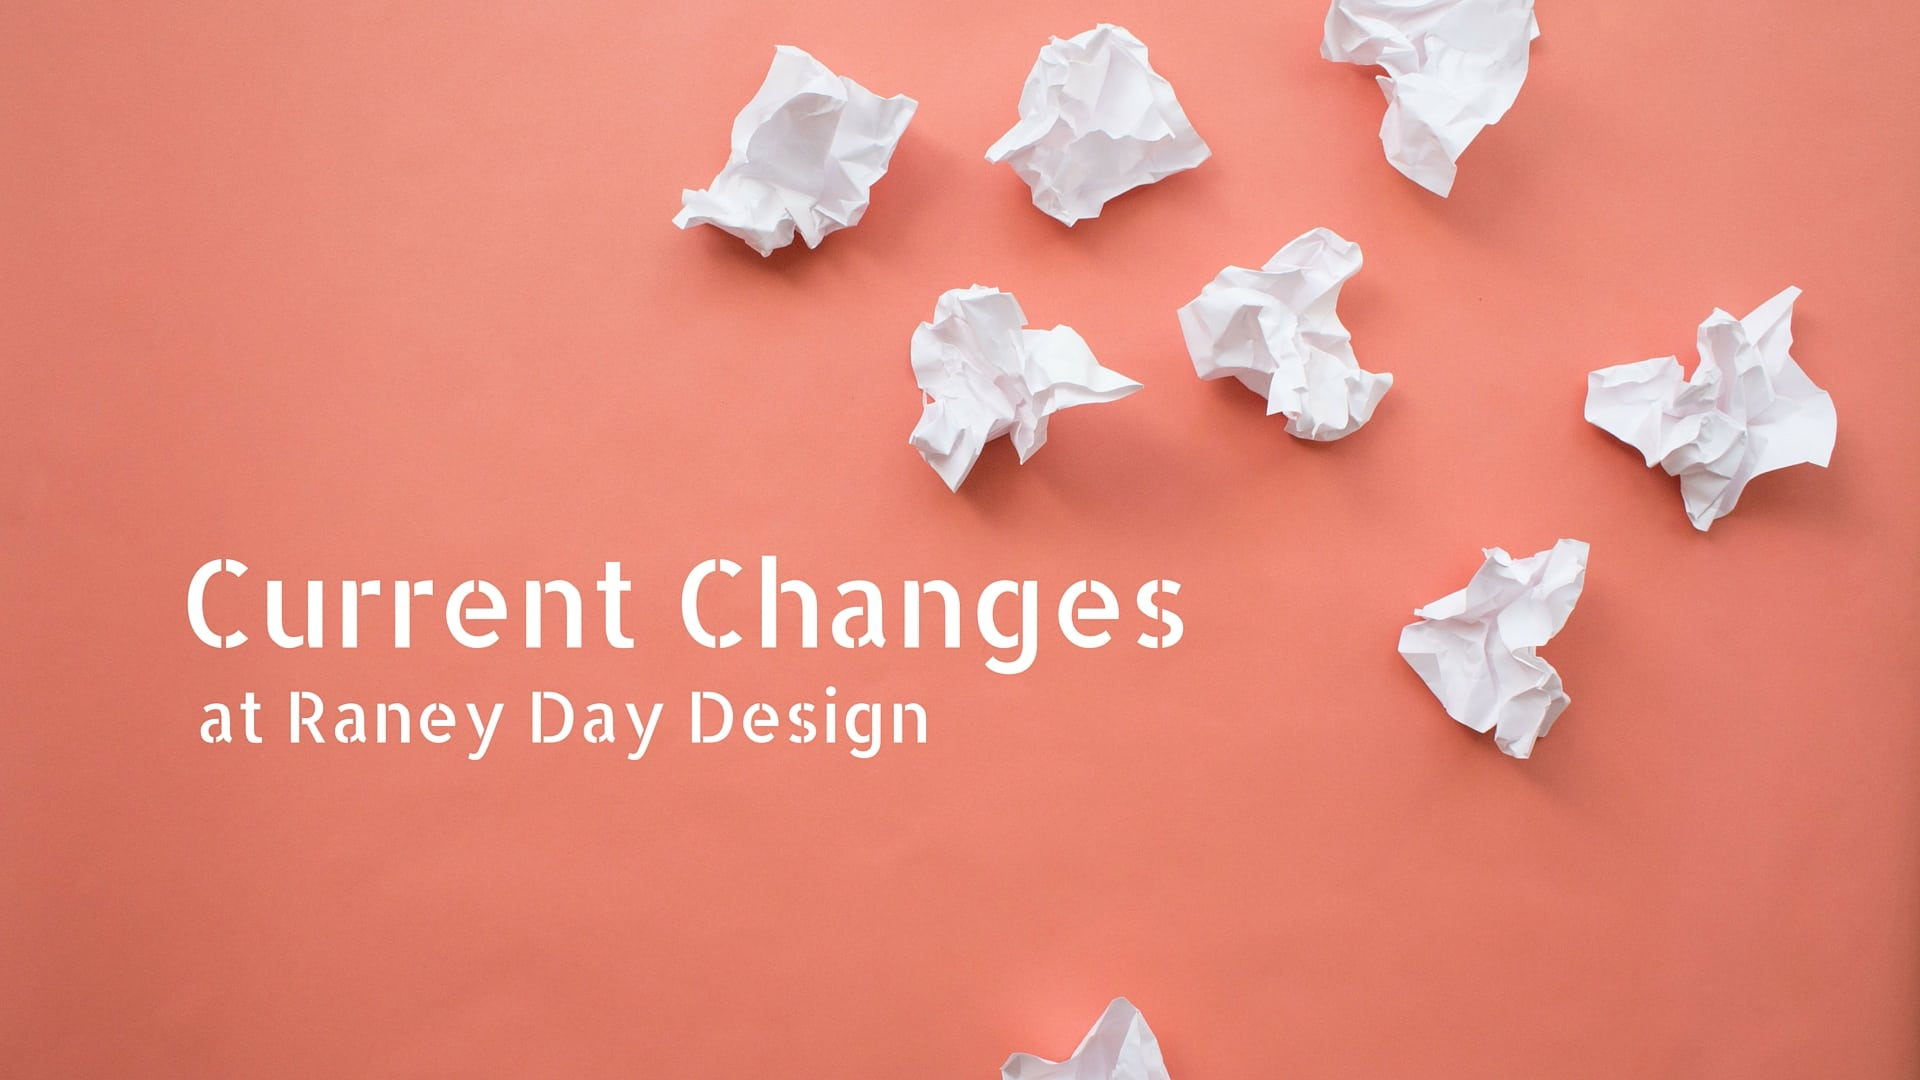 Current changes, Raney Day Design